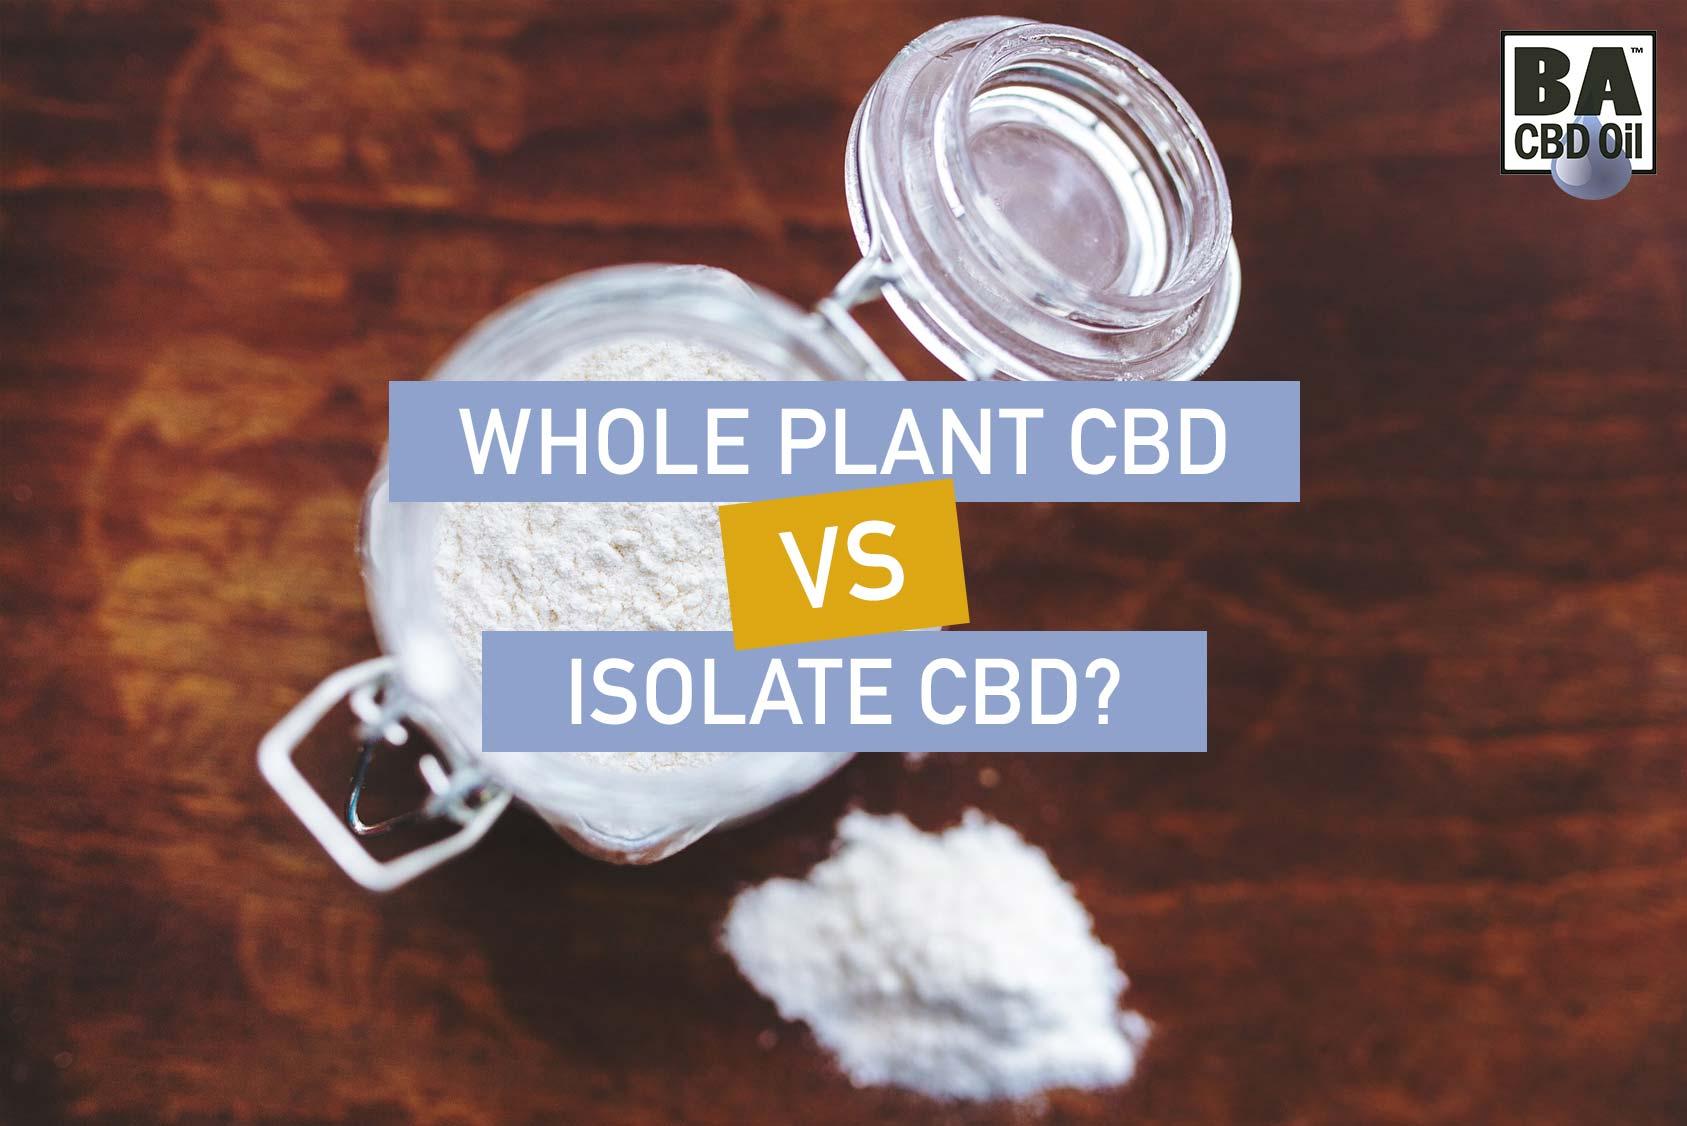 Whole Plant CBD vs Isolate CBD